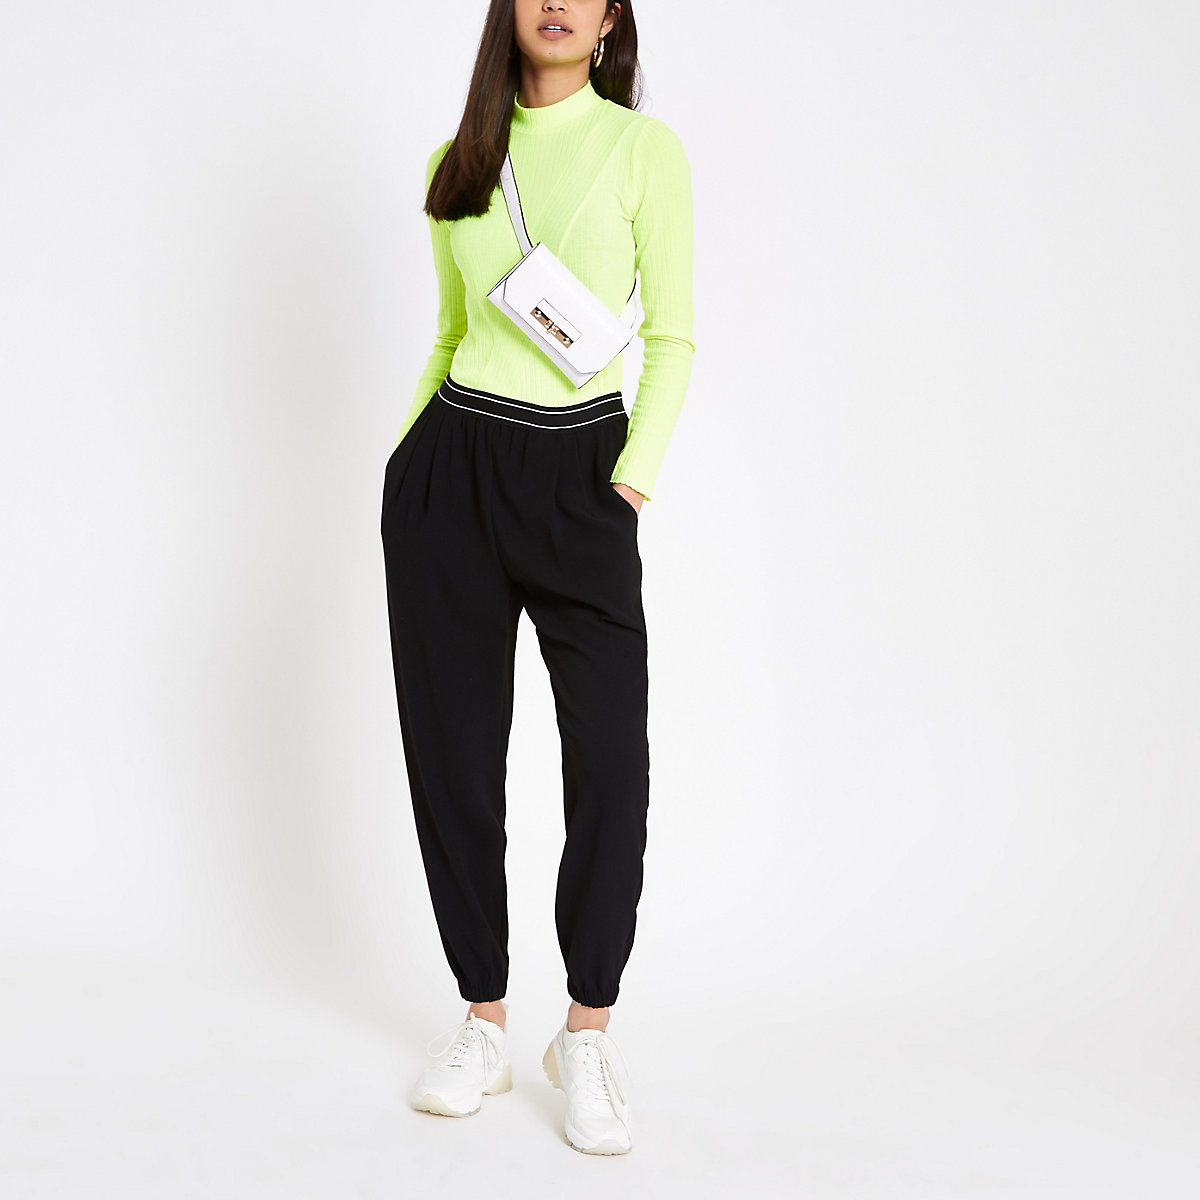 Black cuffed peg trousers